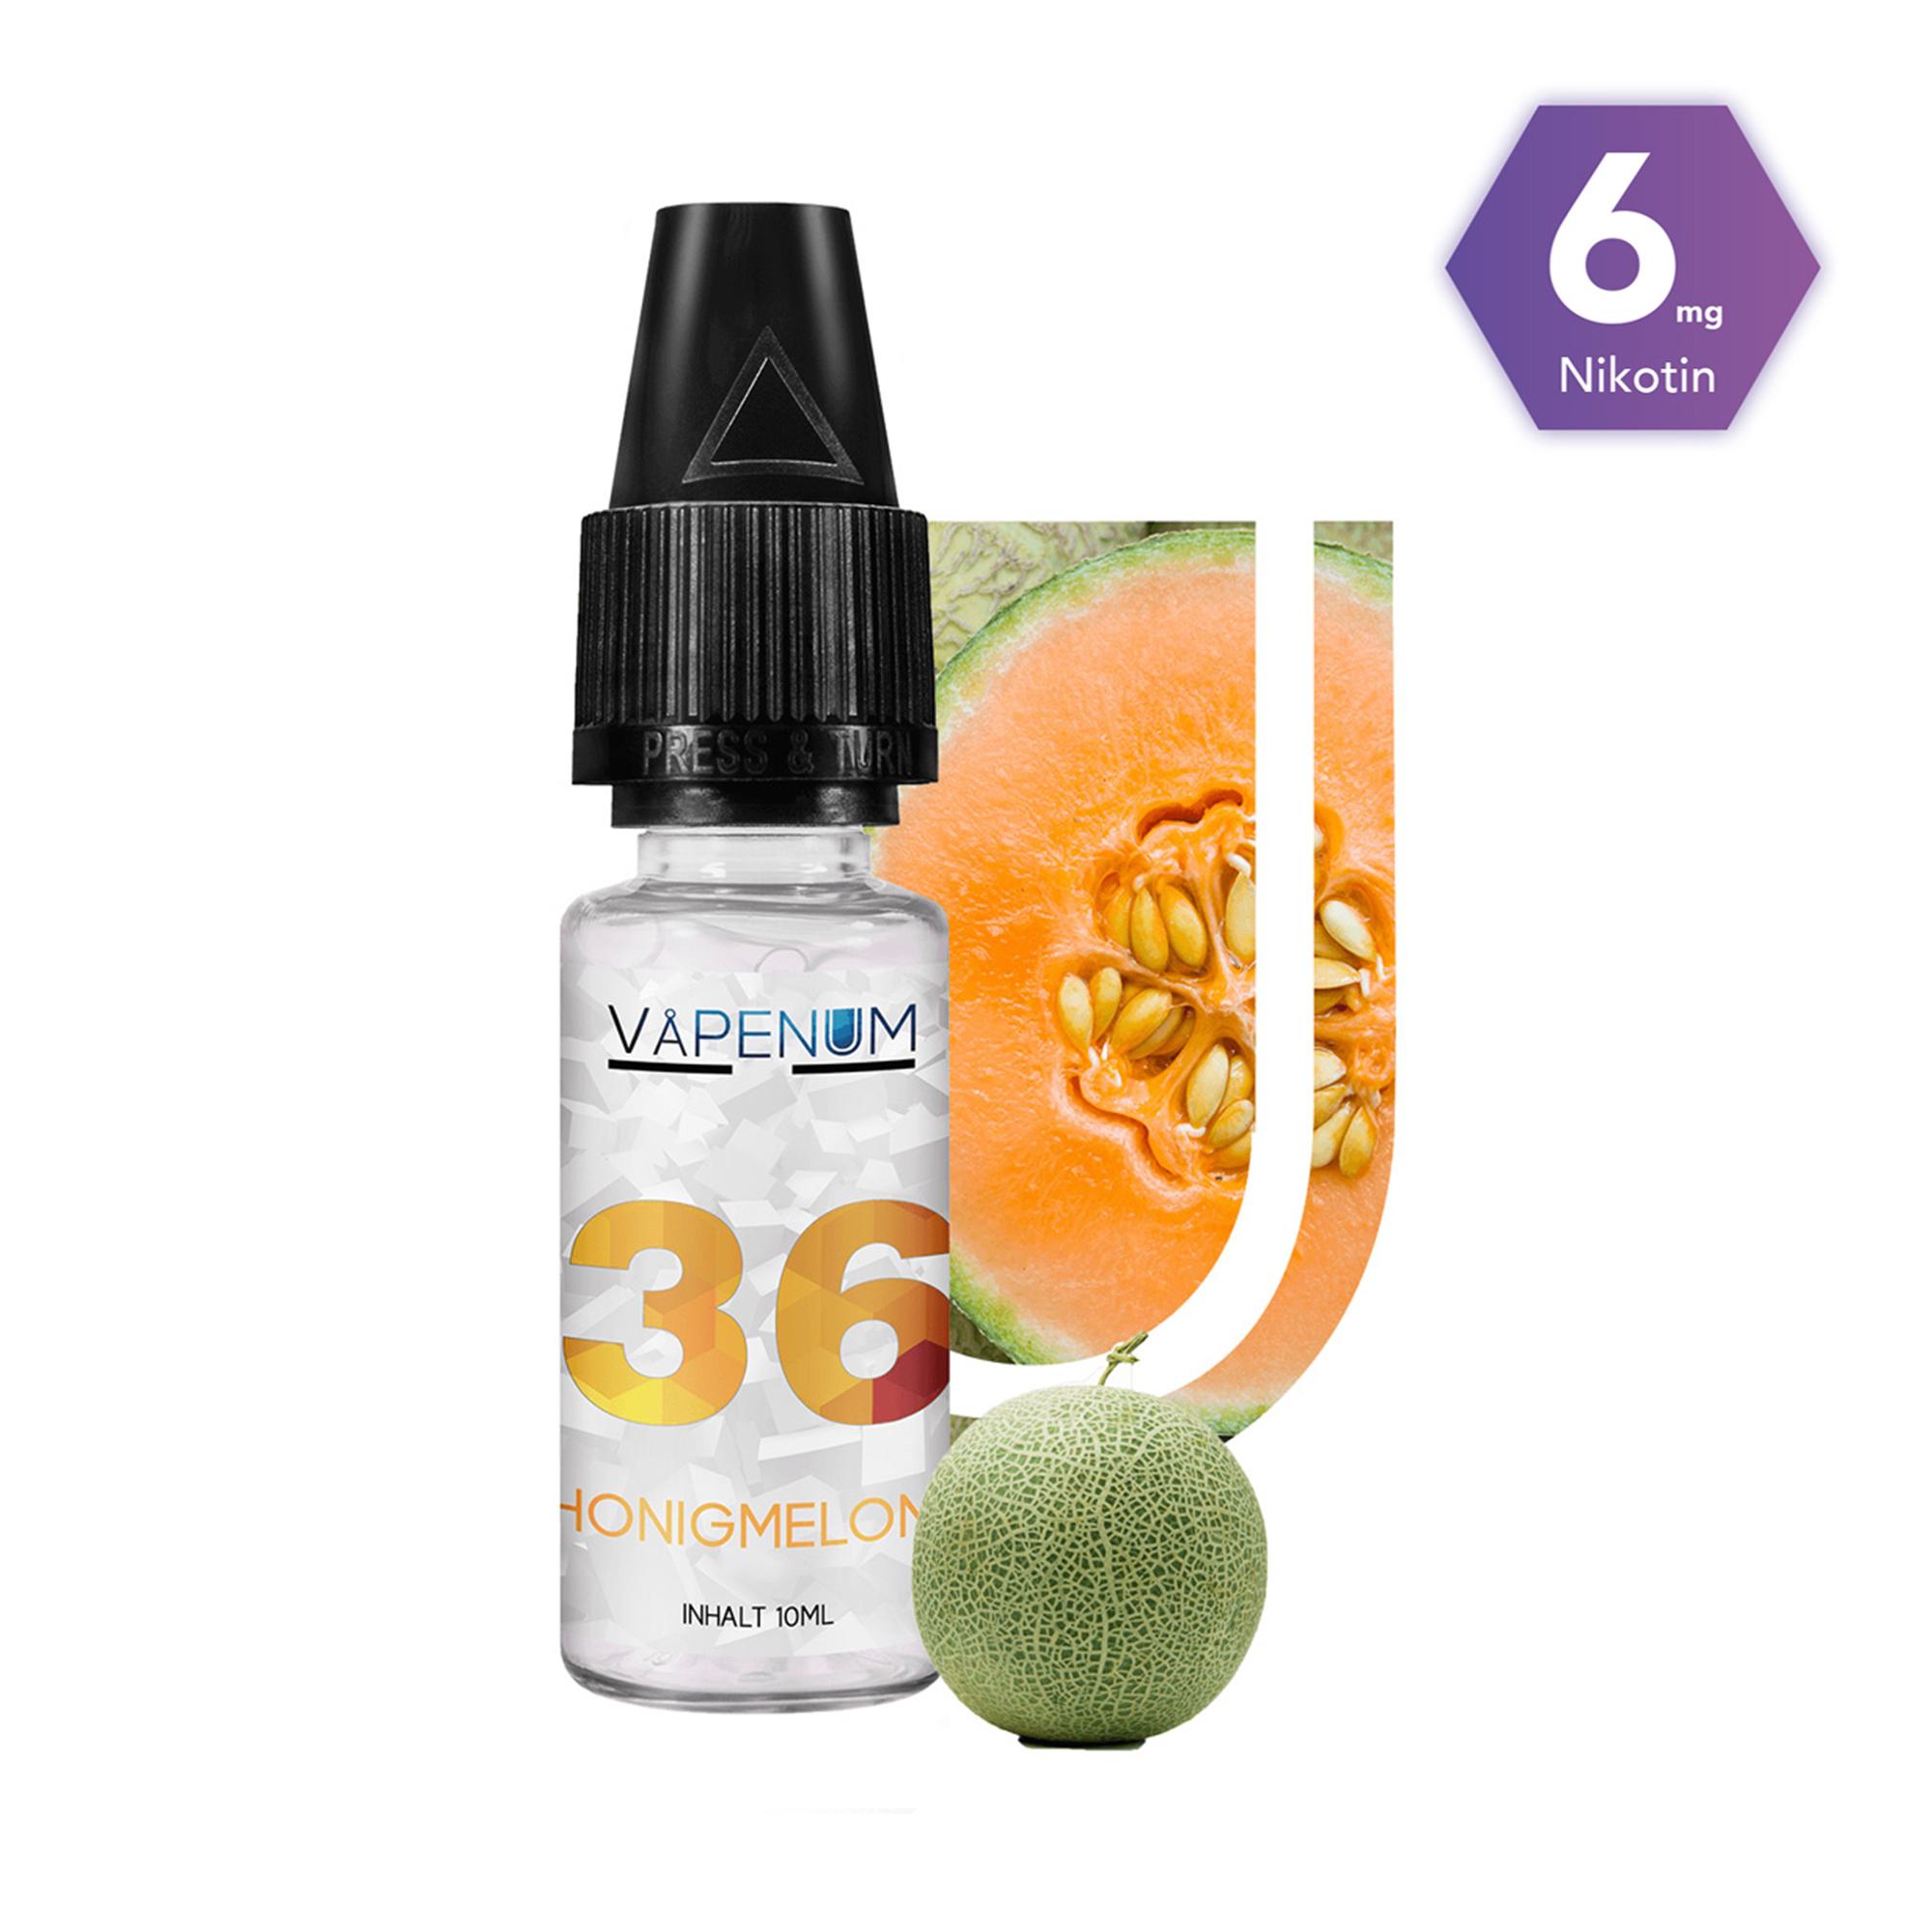 36 - Honigmelone Liquid by Vapenum 6mg